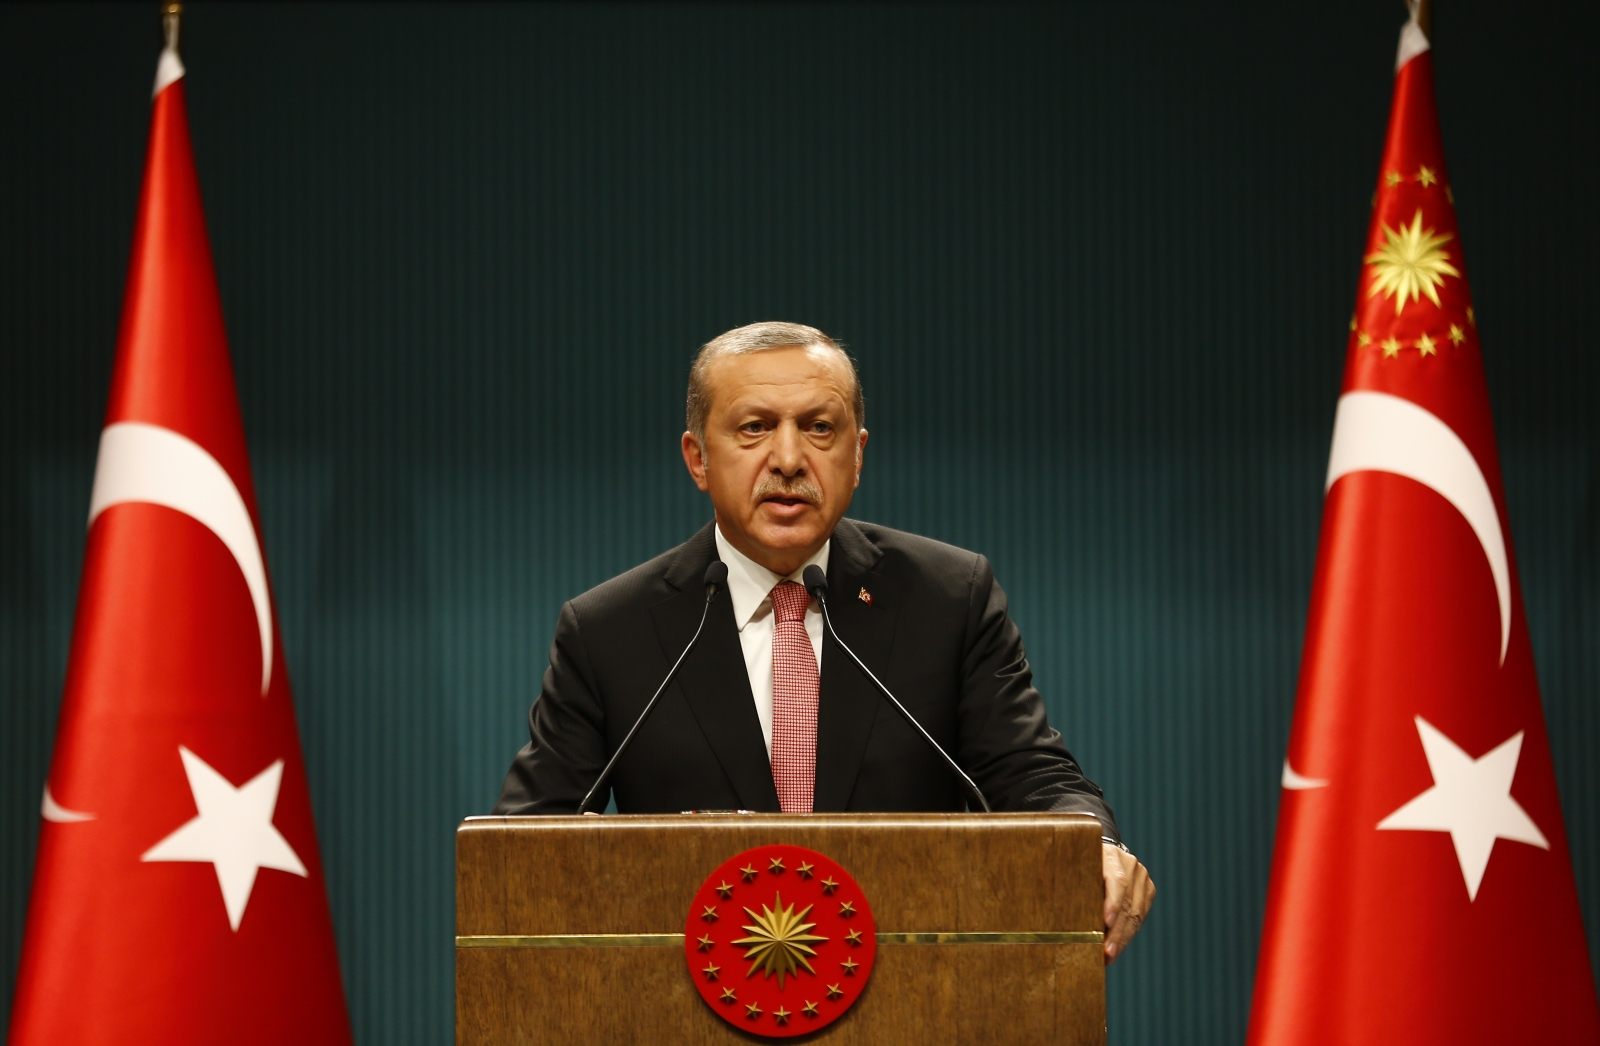 Turkey coup Erdogan speech